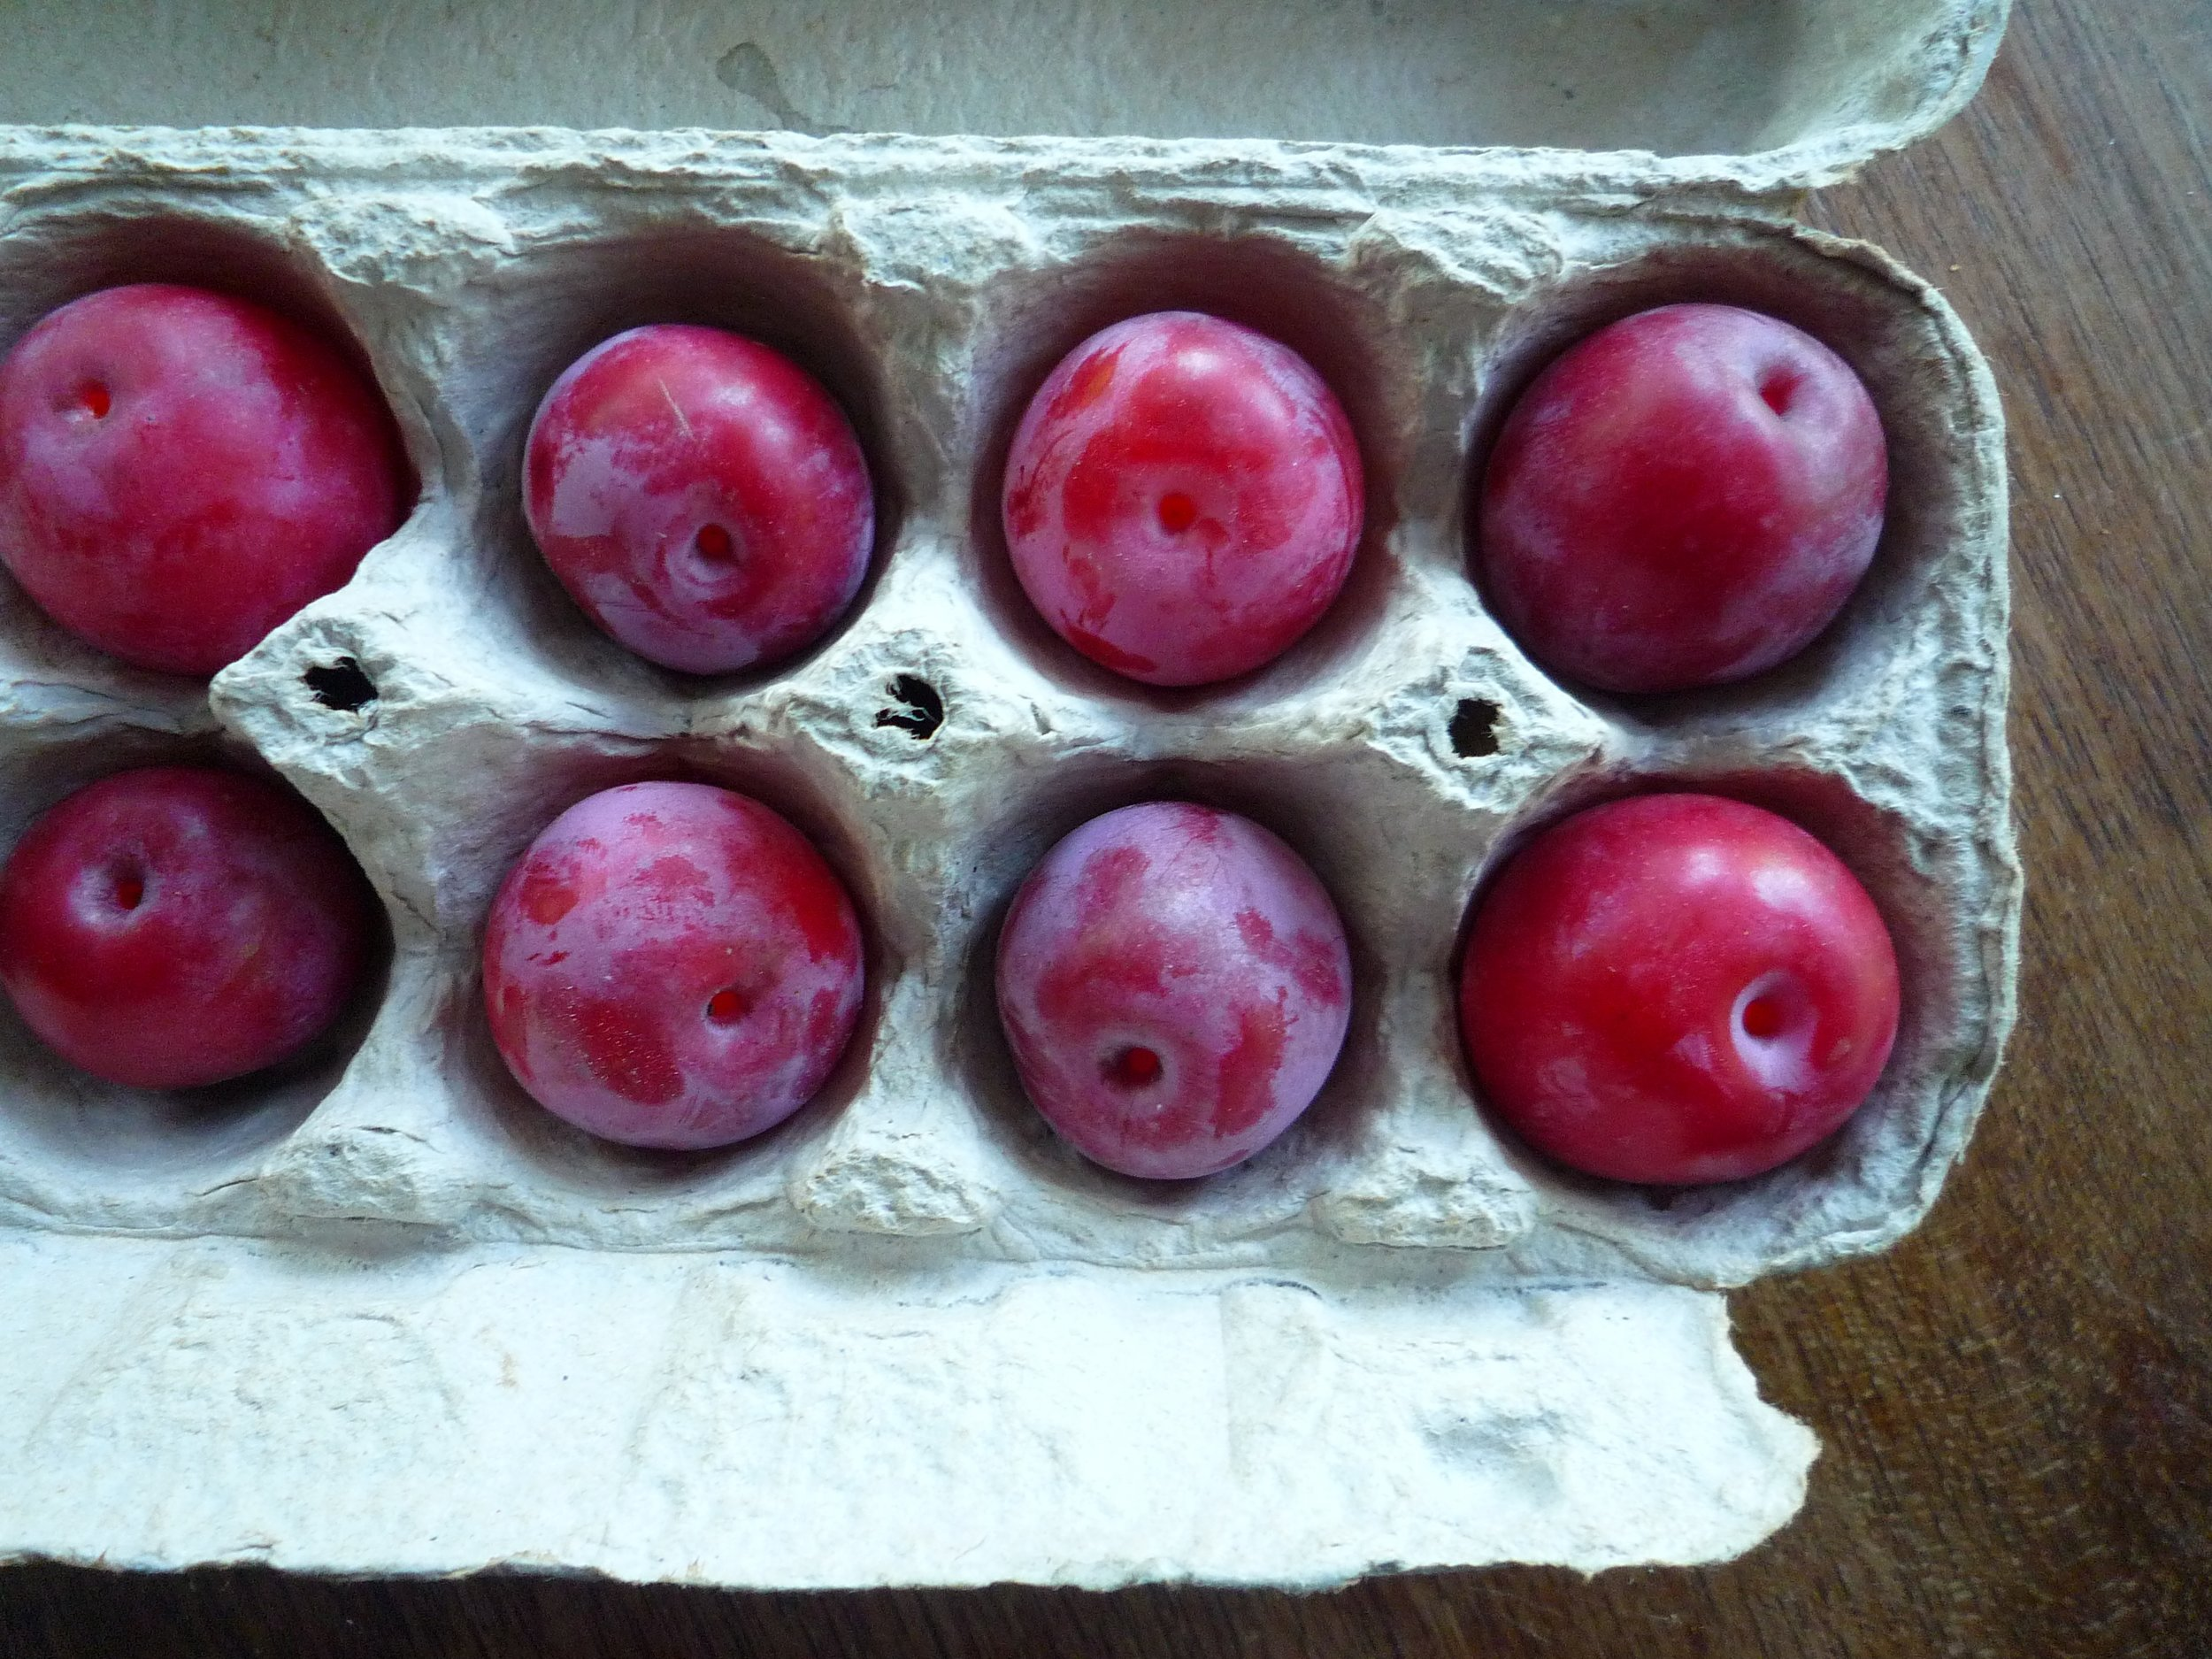 fig. a: fresh plums